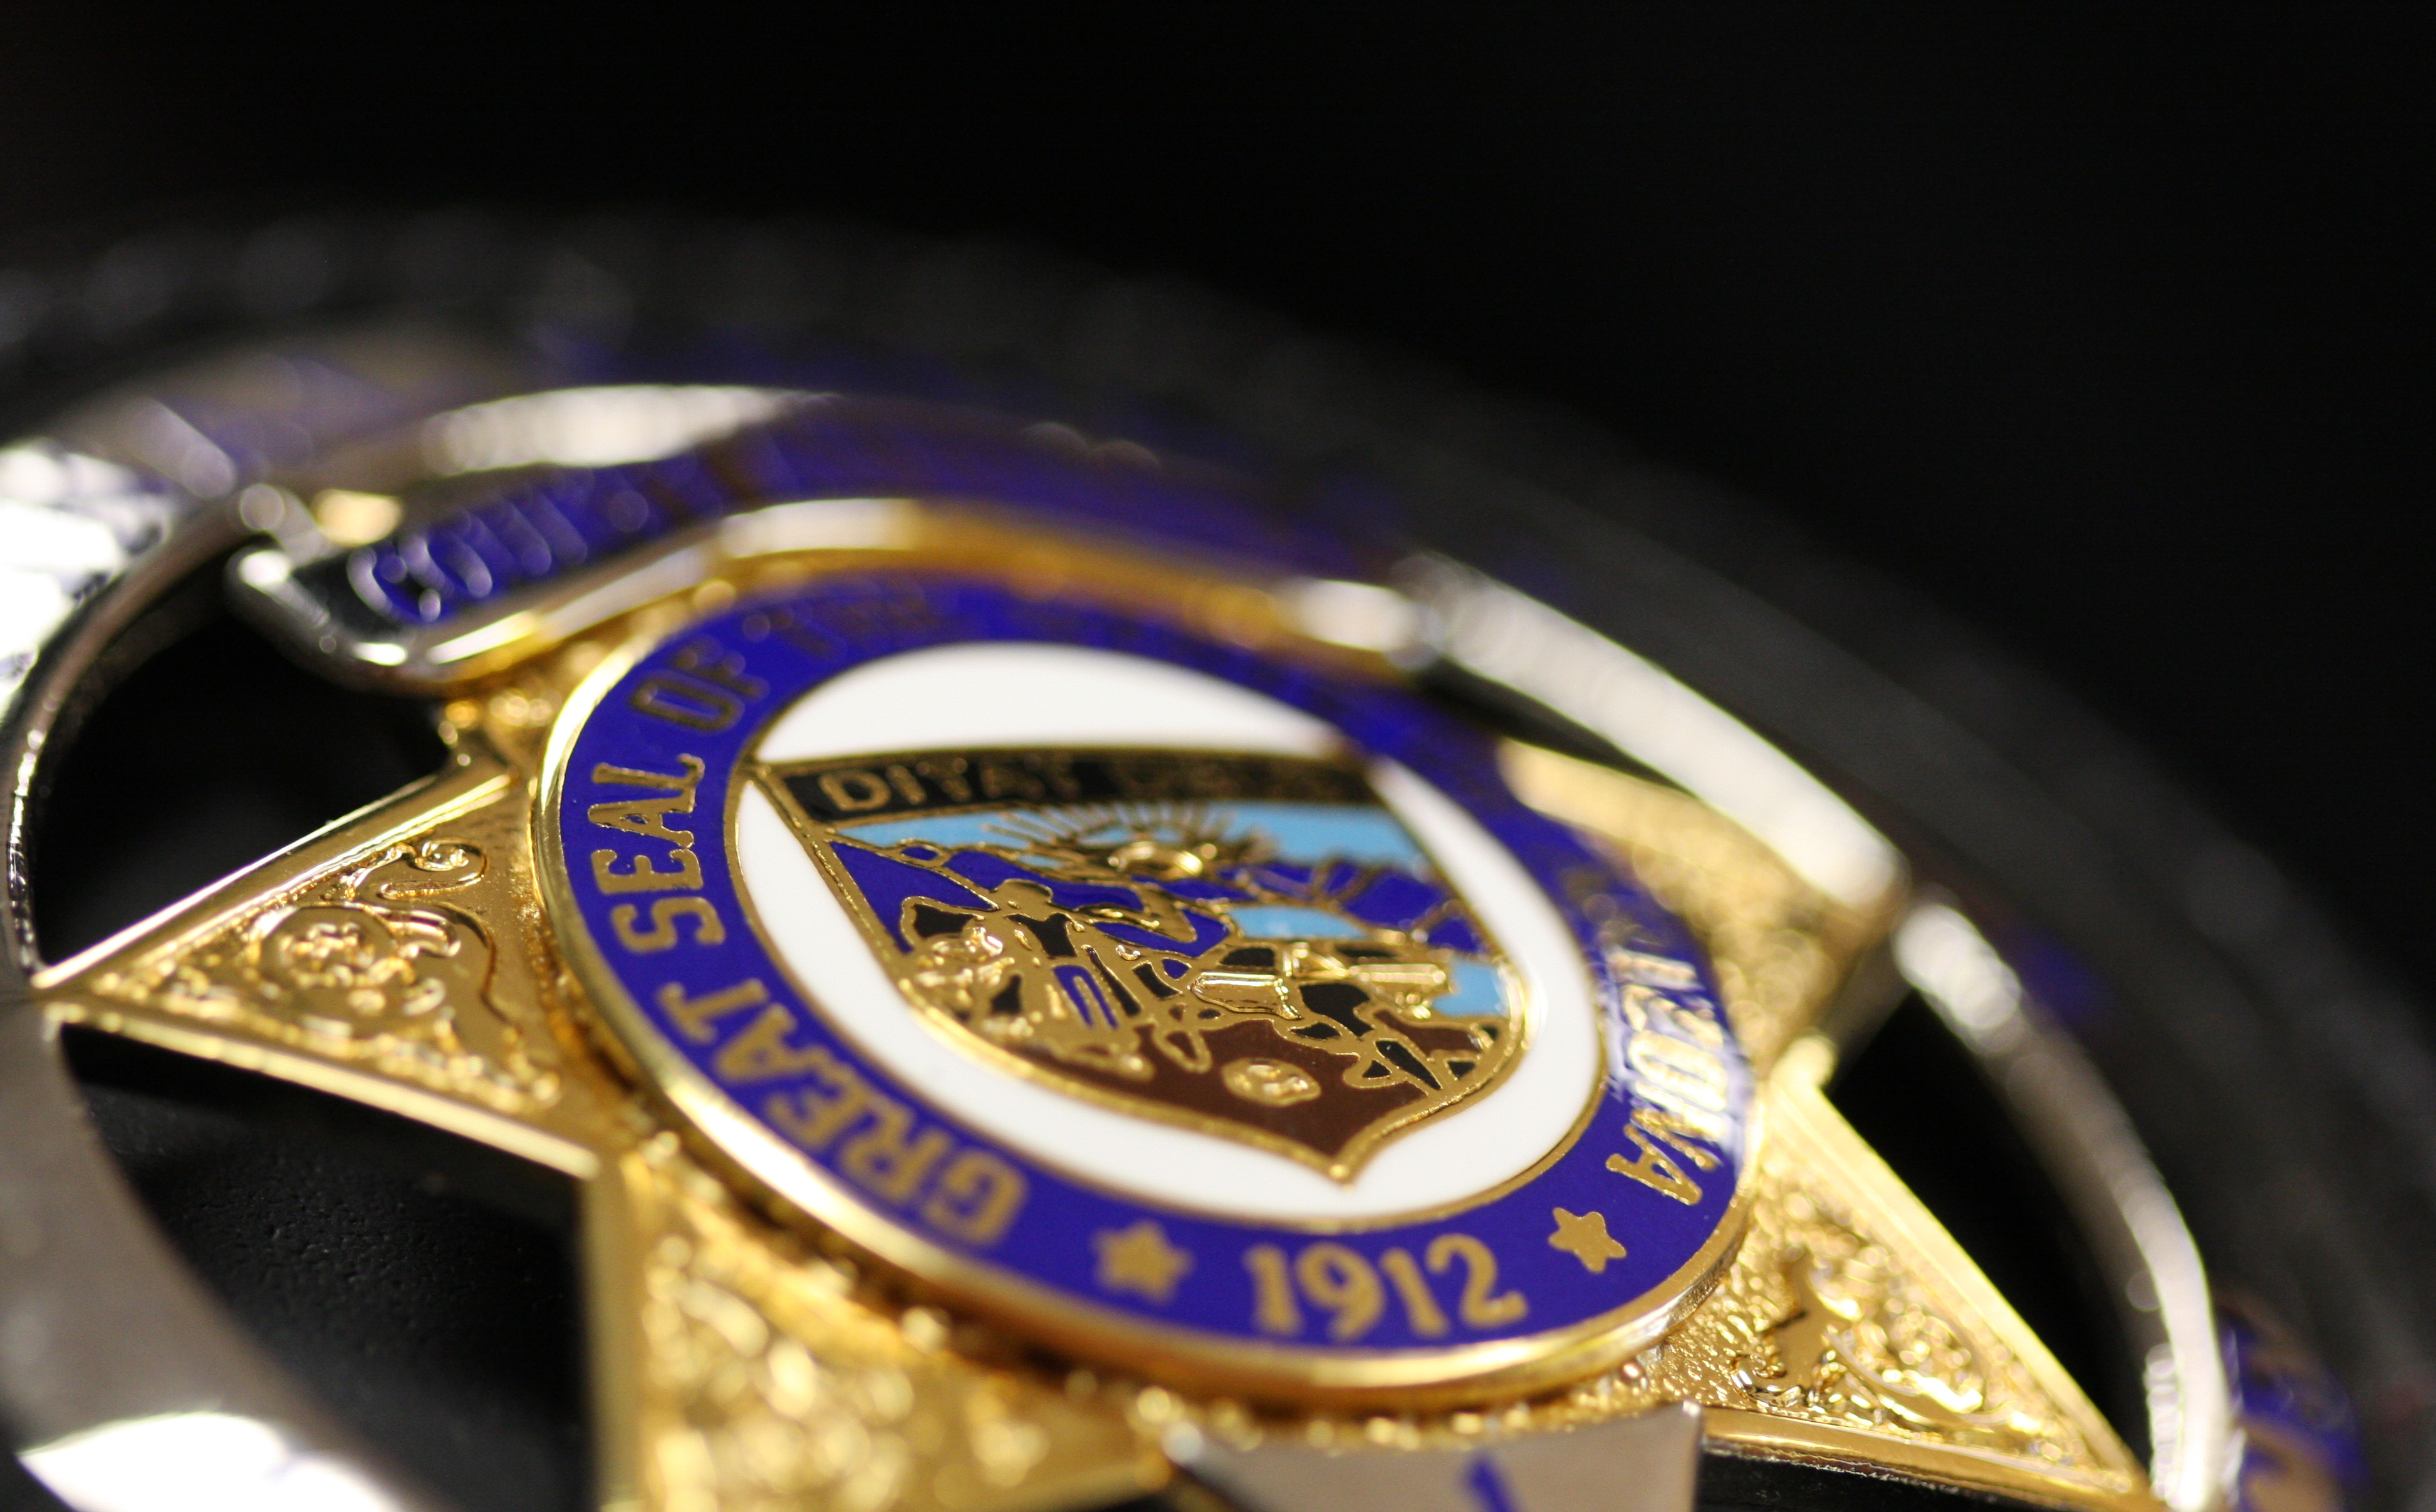 Law mandates public access to criminal statistics